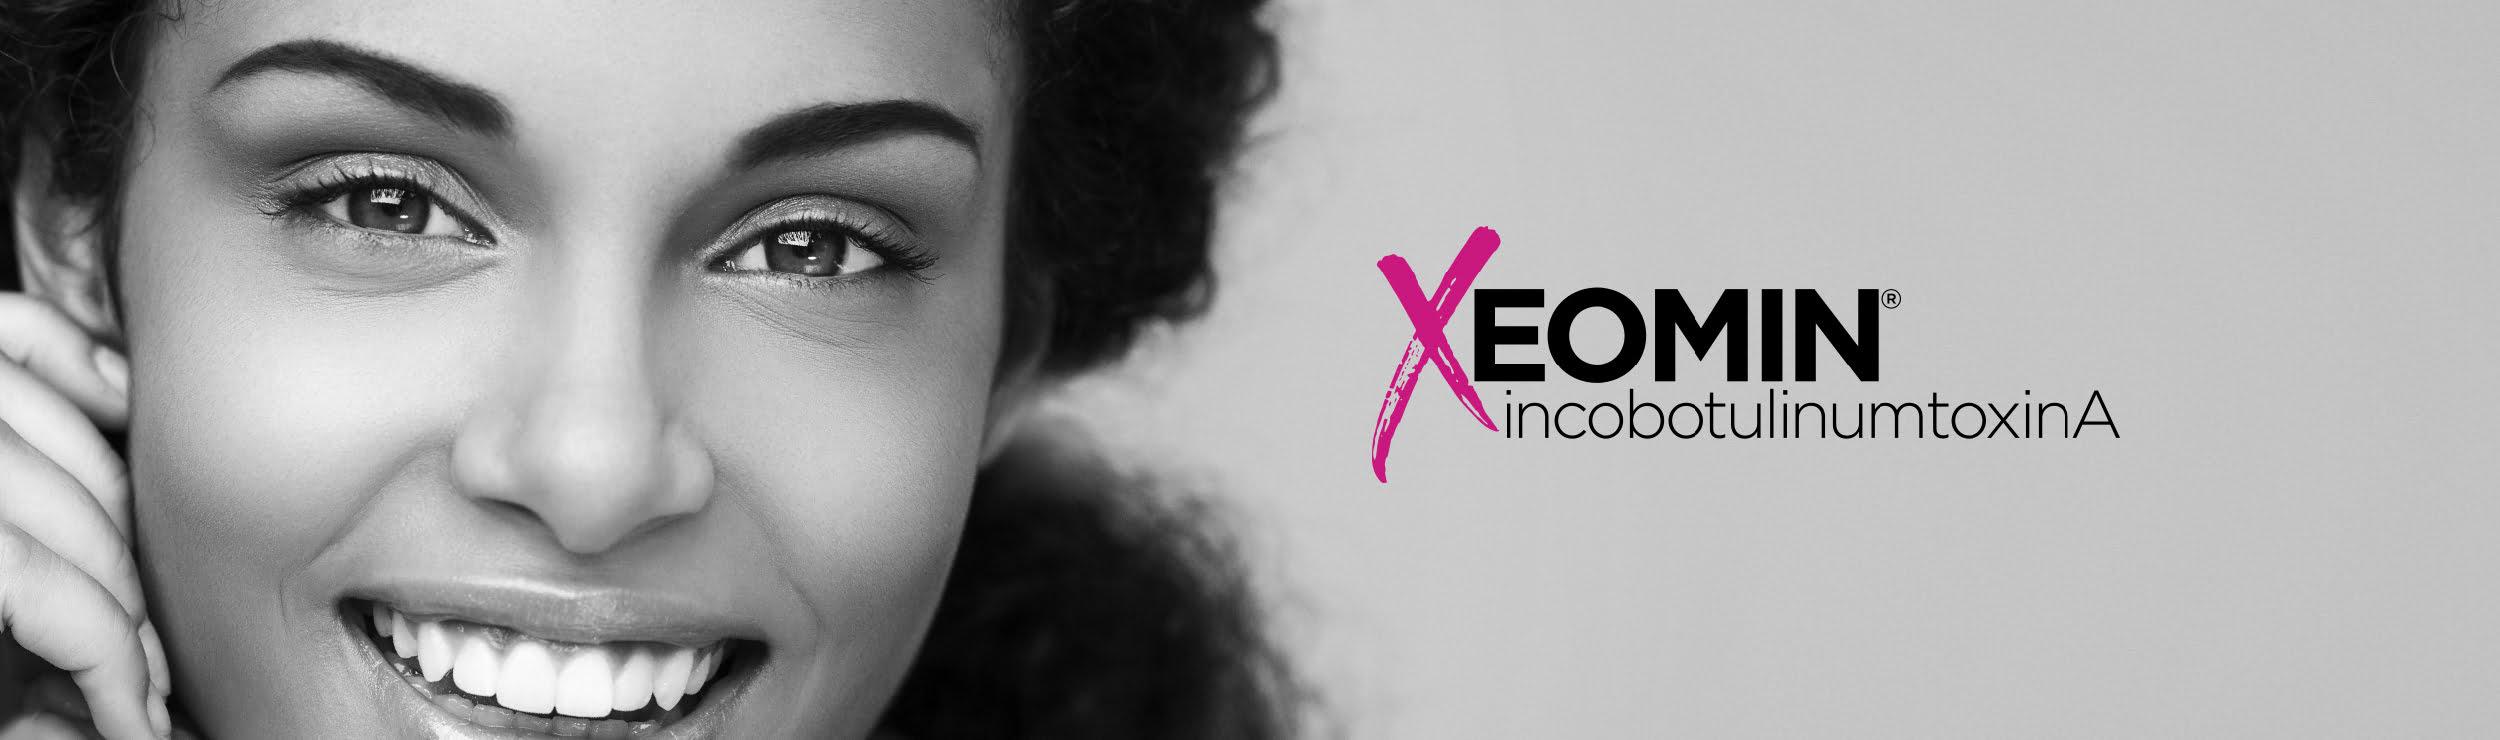 Neurotxins Botox & Xeomin in Atlanta